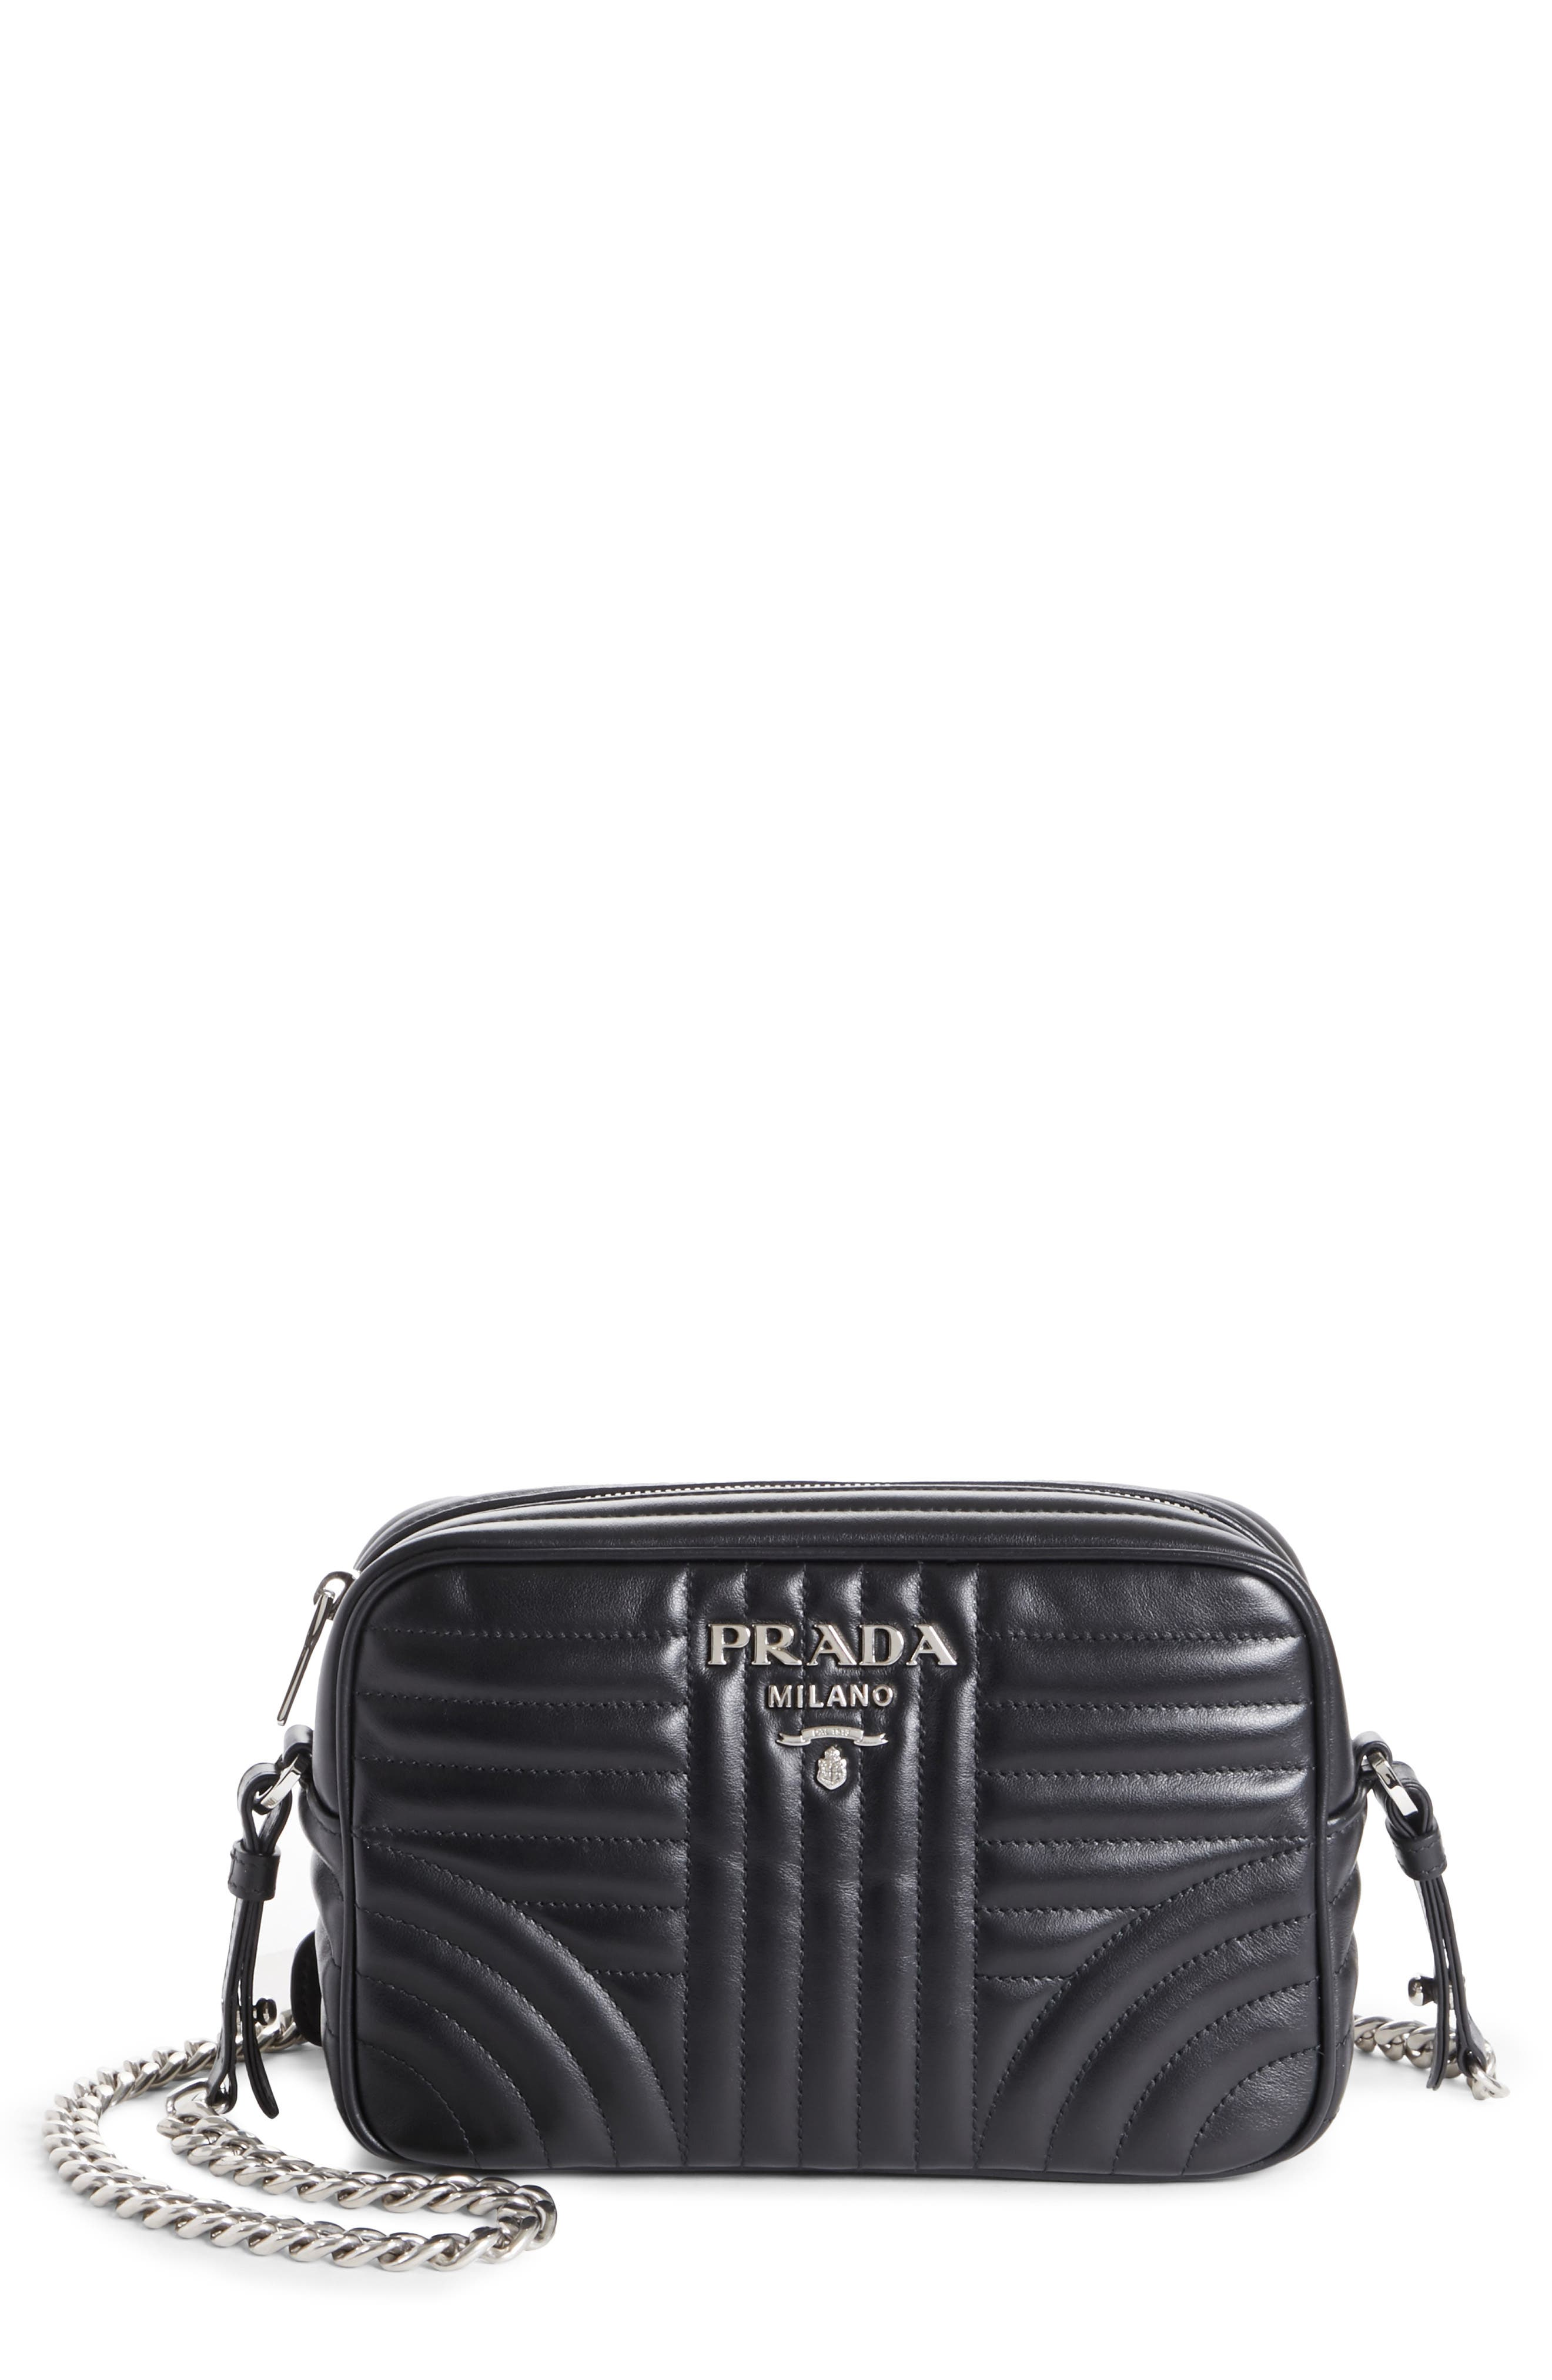 5e93b6c68c ... where can i buy prada handbags at nordstrom best handbag 2017 ae703  dd847